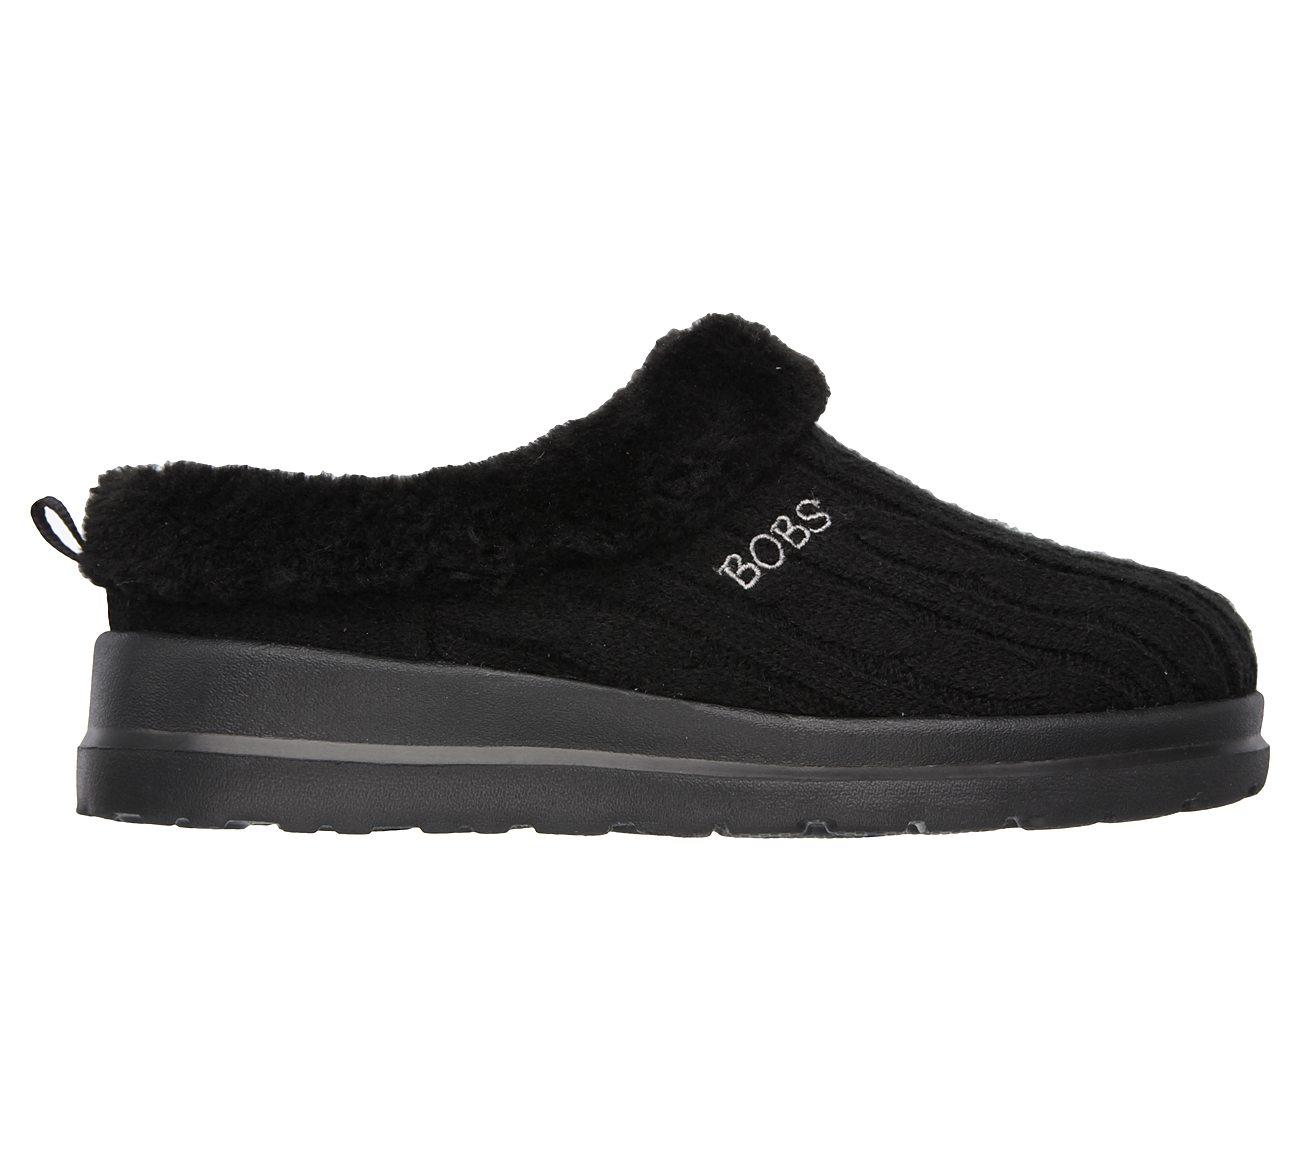 Buy SKECHERS Bobs Cherish Wonder Fall Bobs Shoes mSHLH